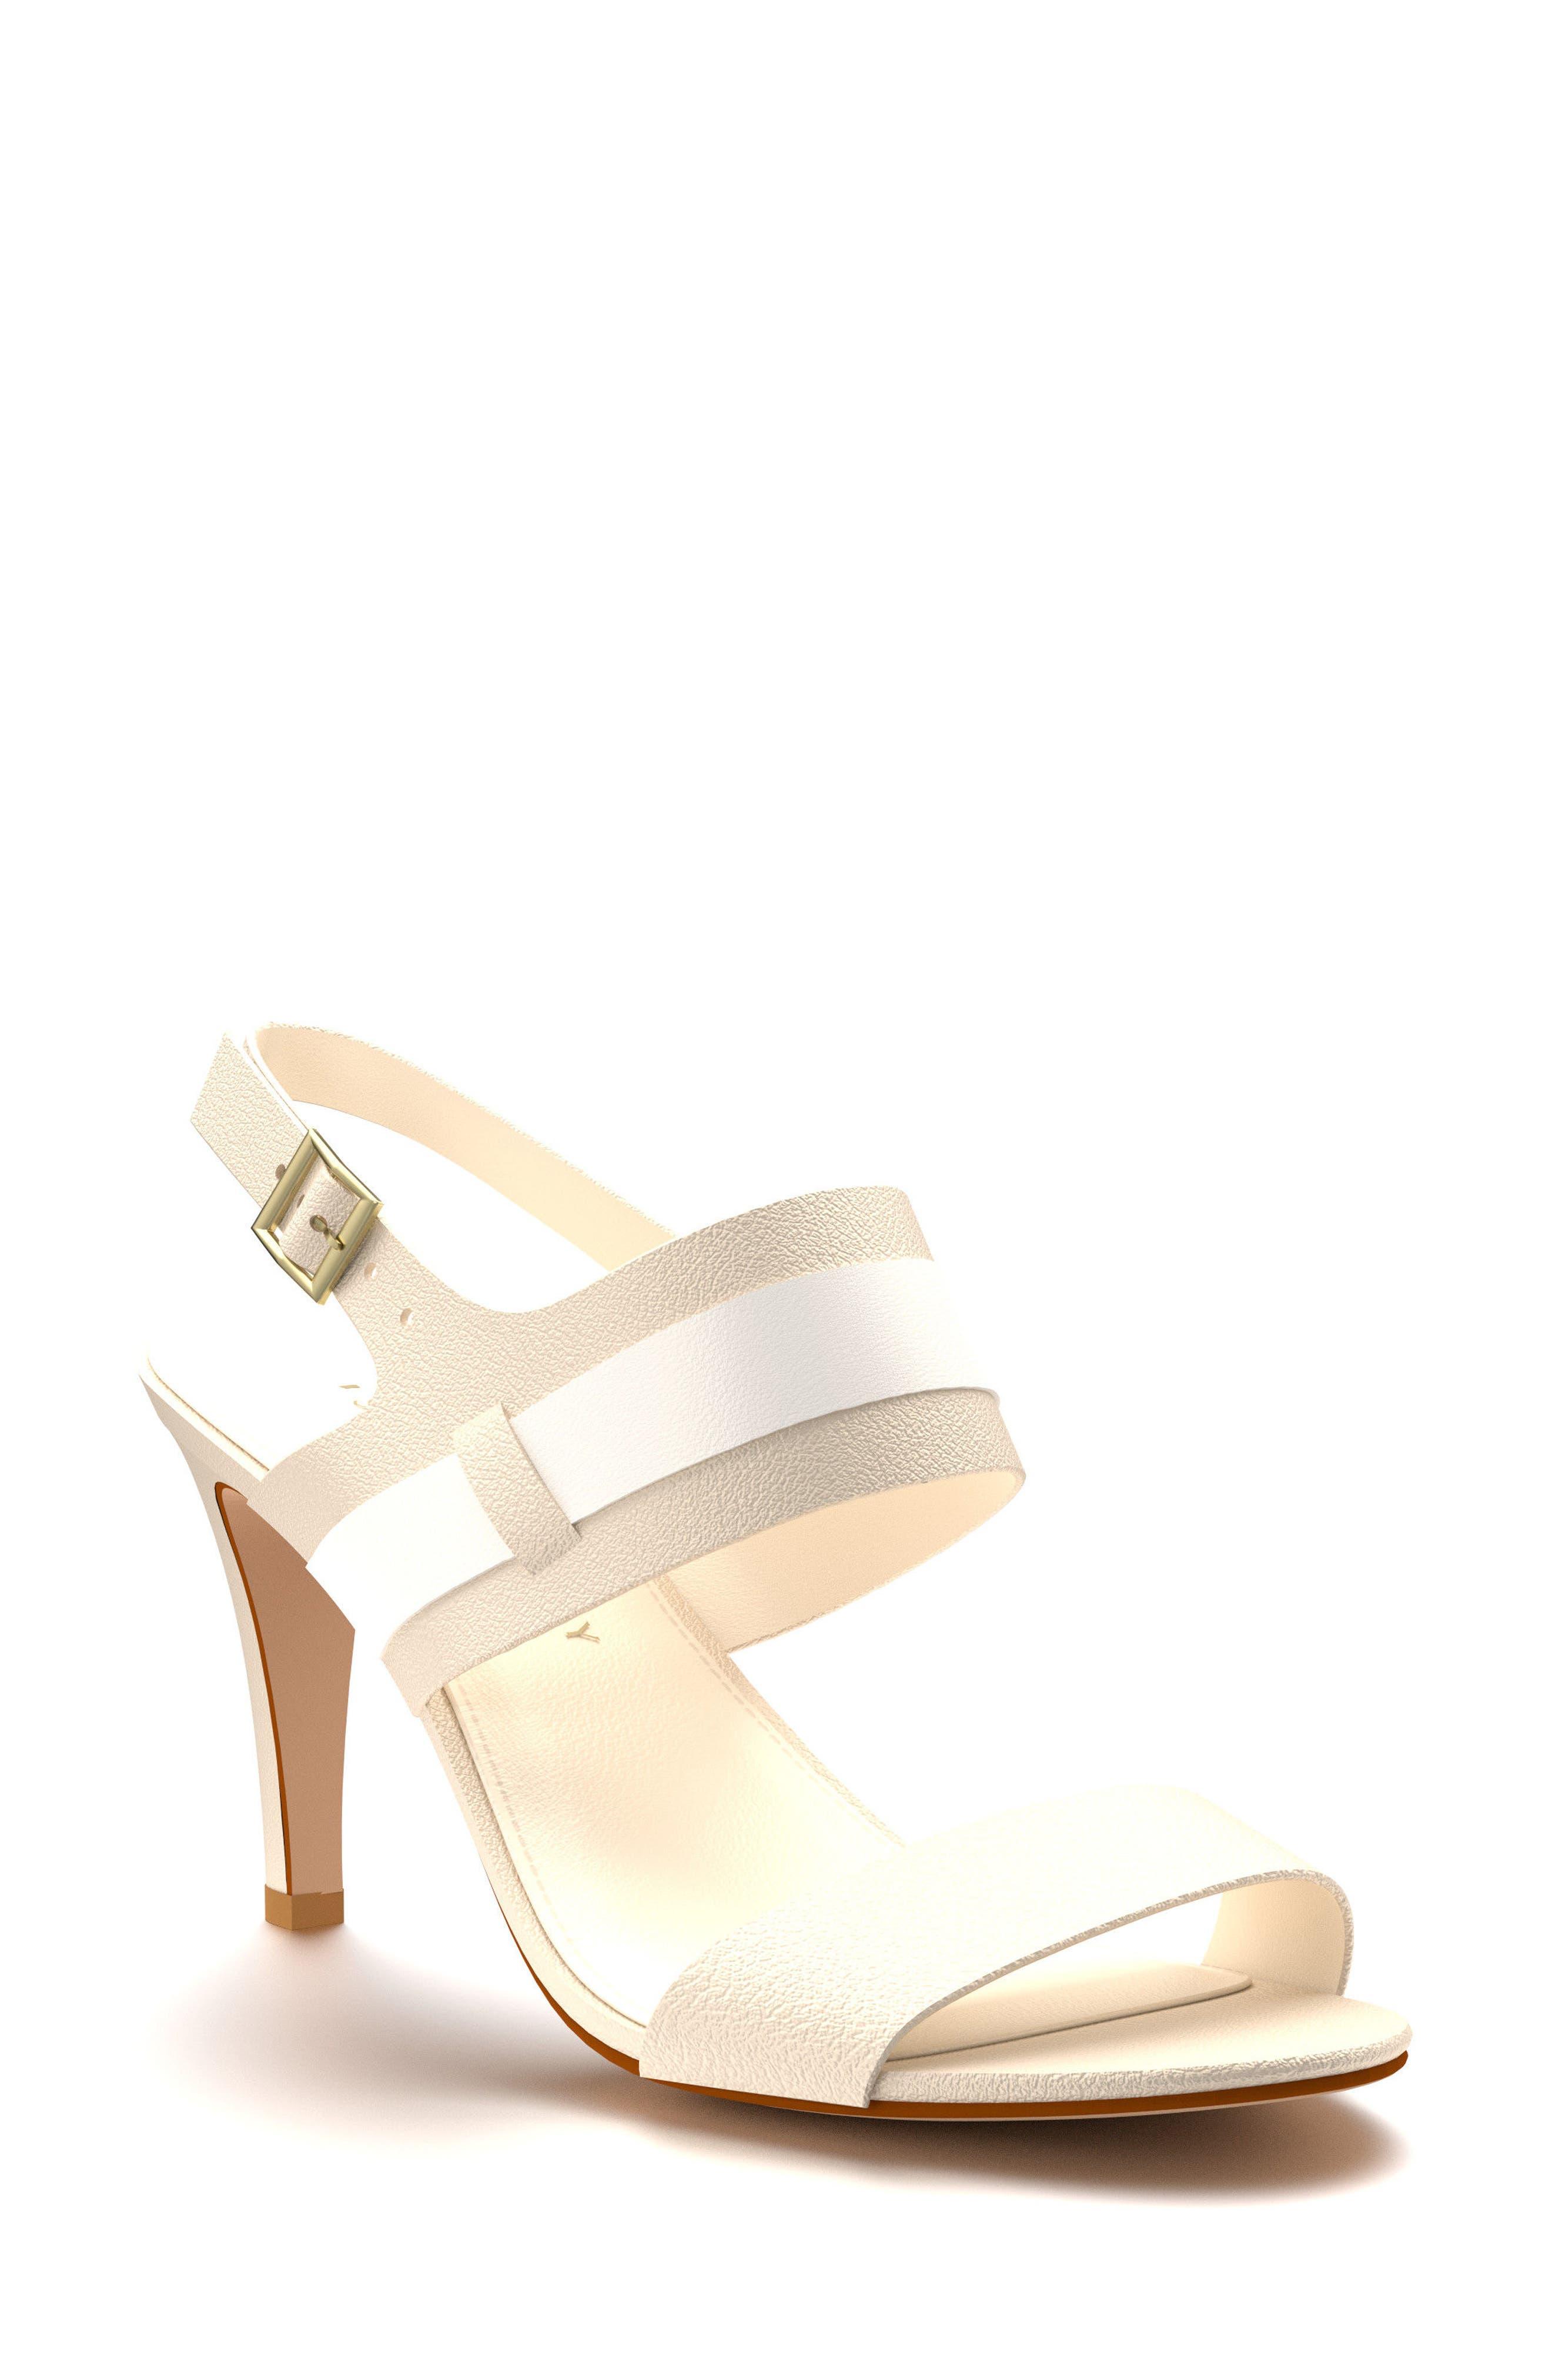 Shoes of Prey Strappy Slingback Sandal (Women)